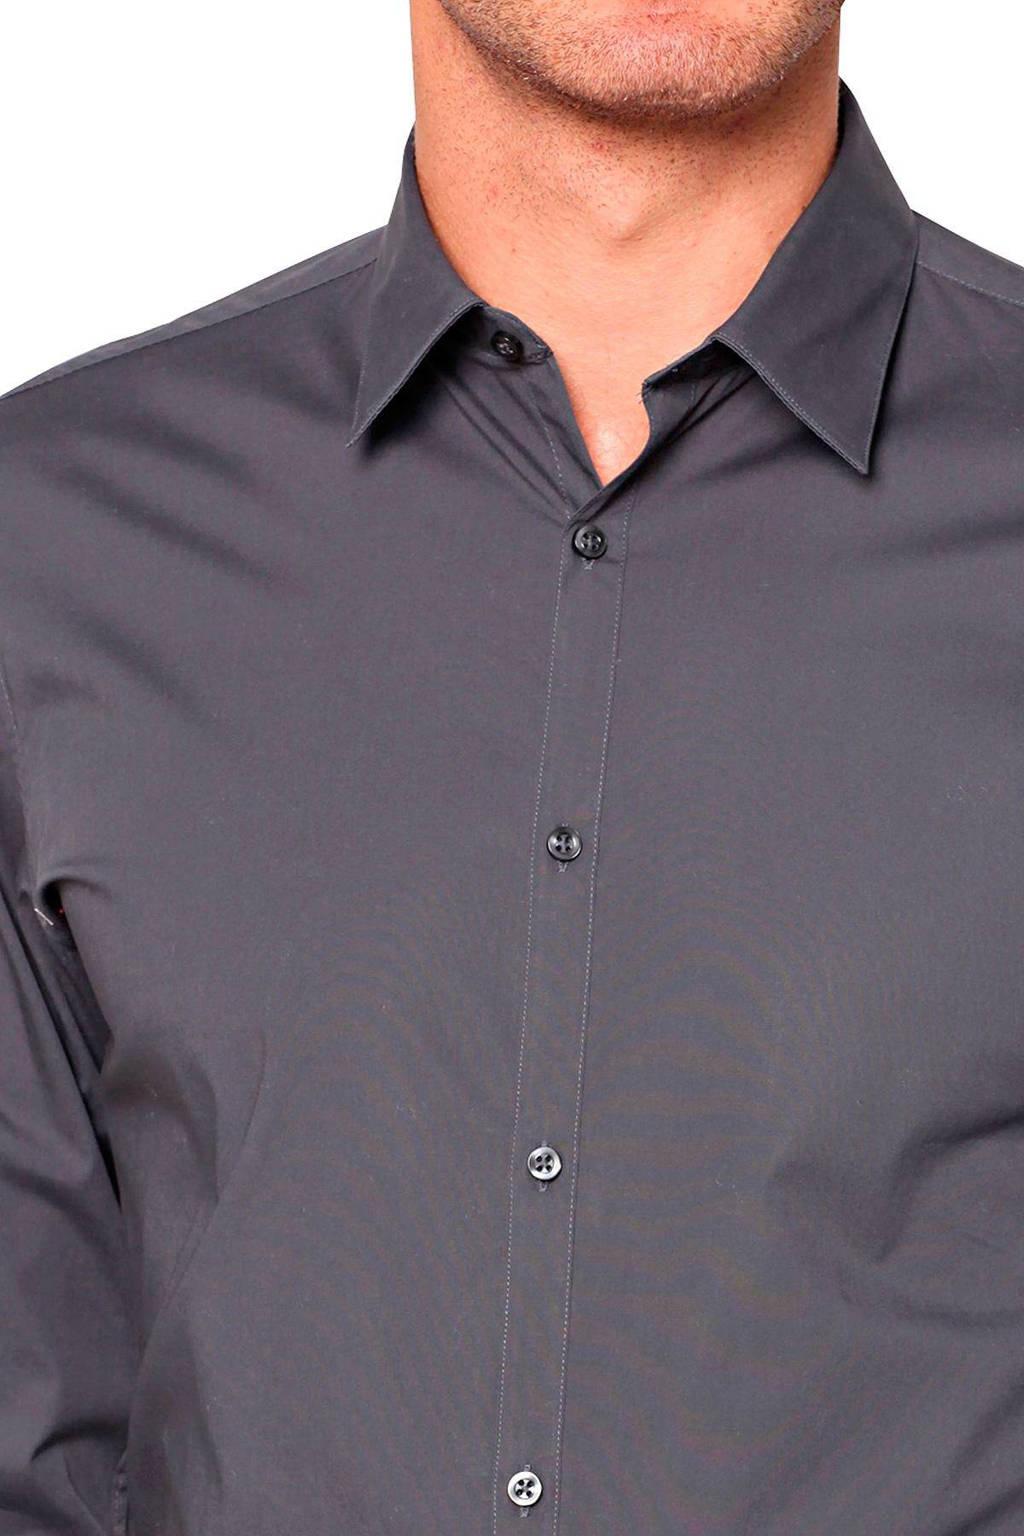 Overhemd We.We Fashion Slim Fit Overhemd Wehkamp